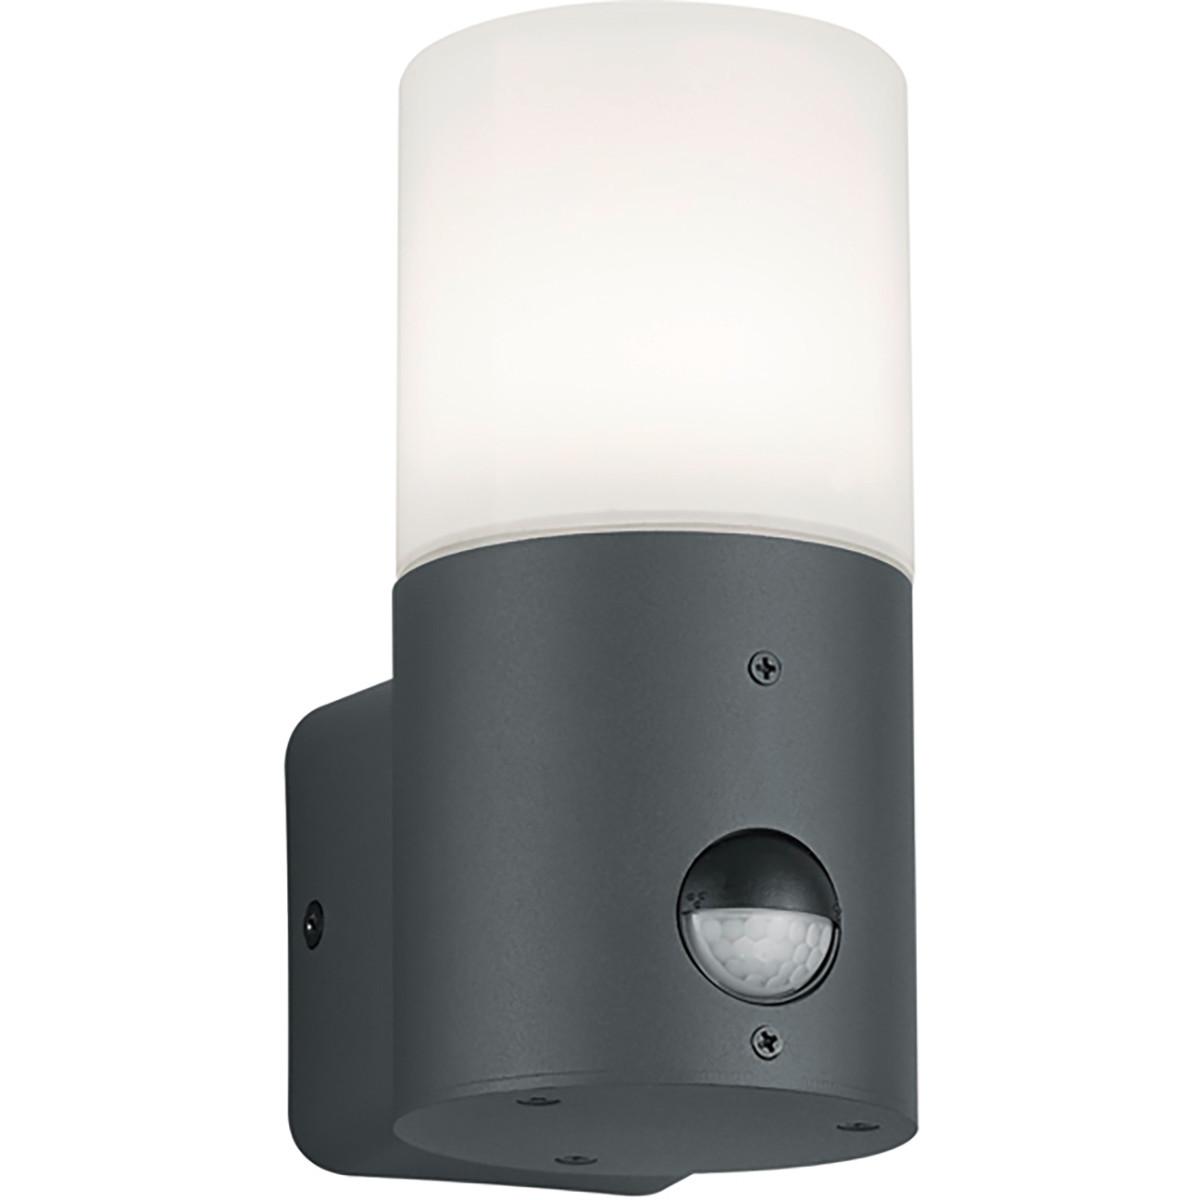 LED Tuinverlichting - Wandlamp - Trion Hosina - Bewegingssensor - E27 Fitting - Mat Zwart - Aluminiu